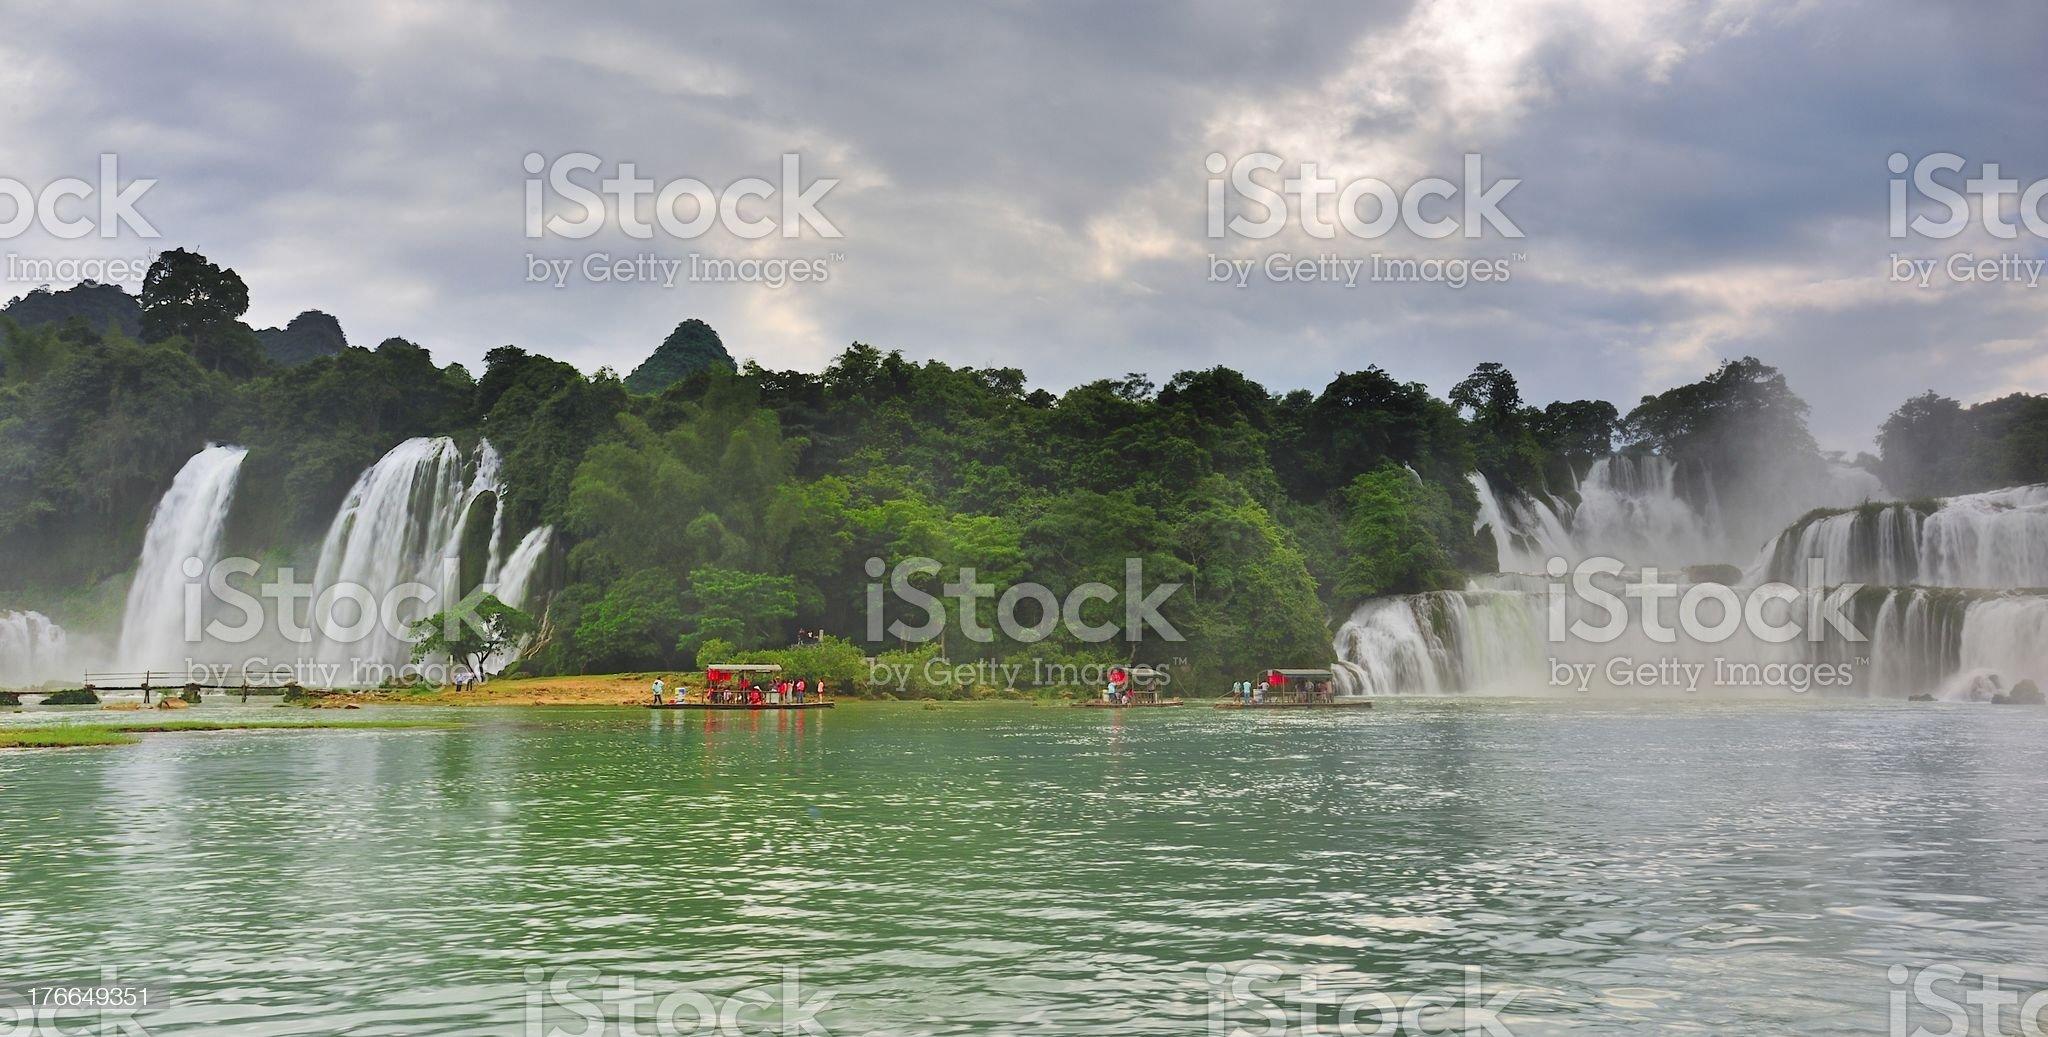 China Tak Tin(Detian)Waterfall panorama royalty-free stock photo